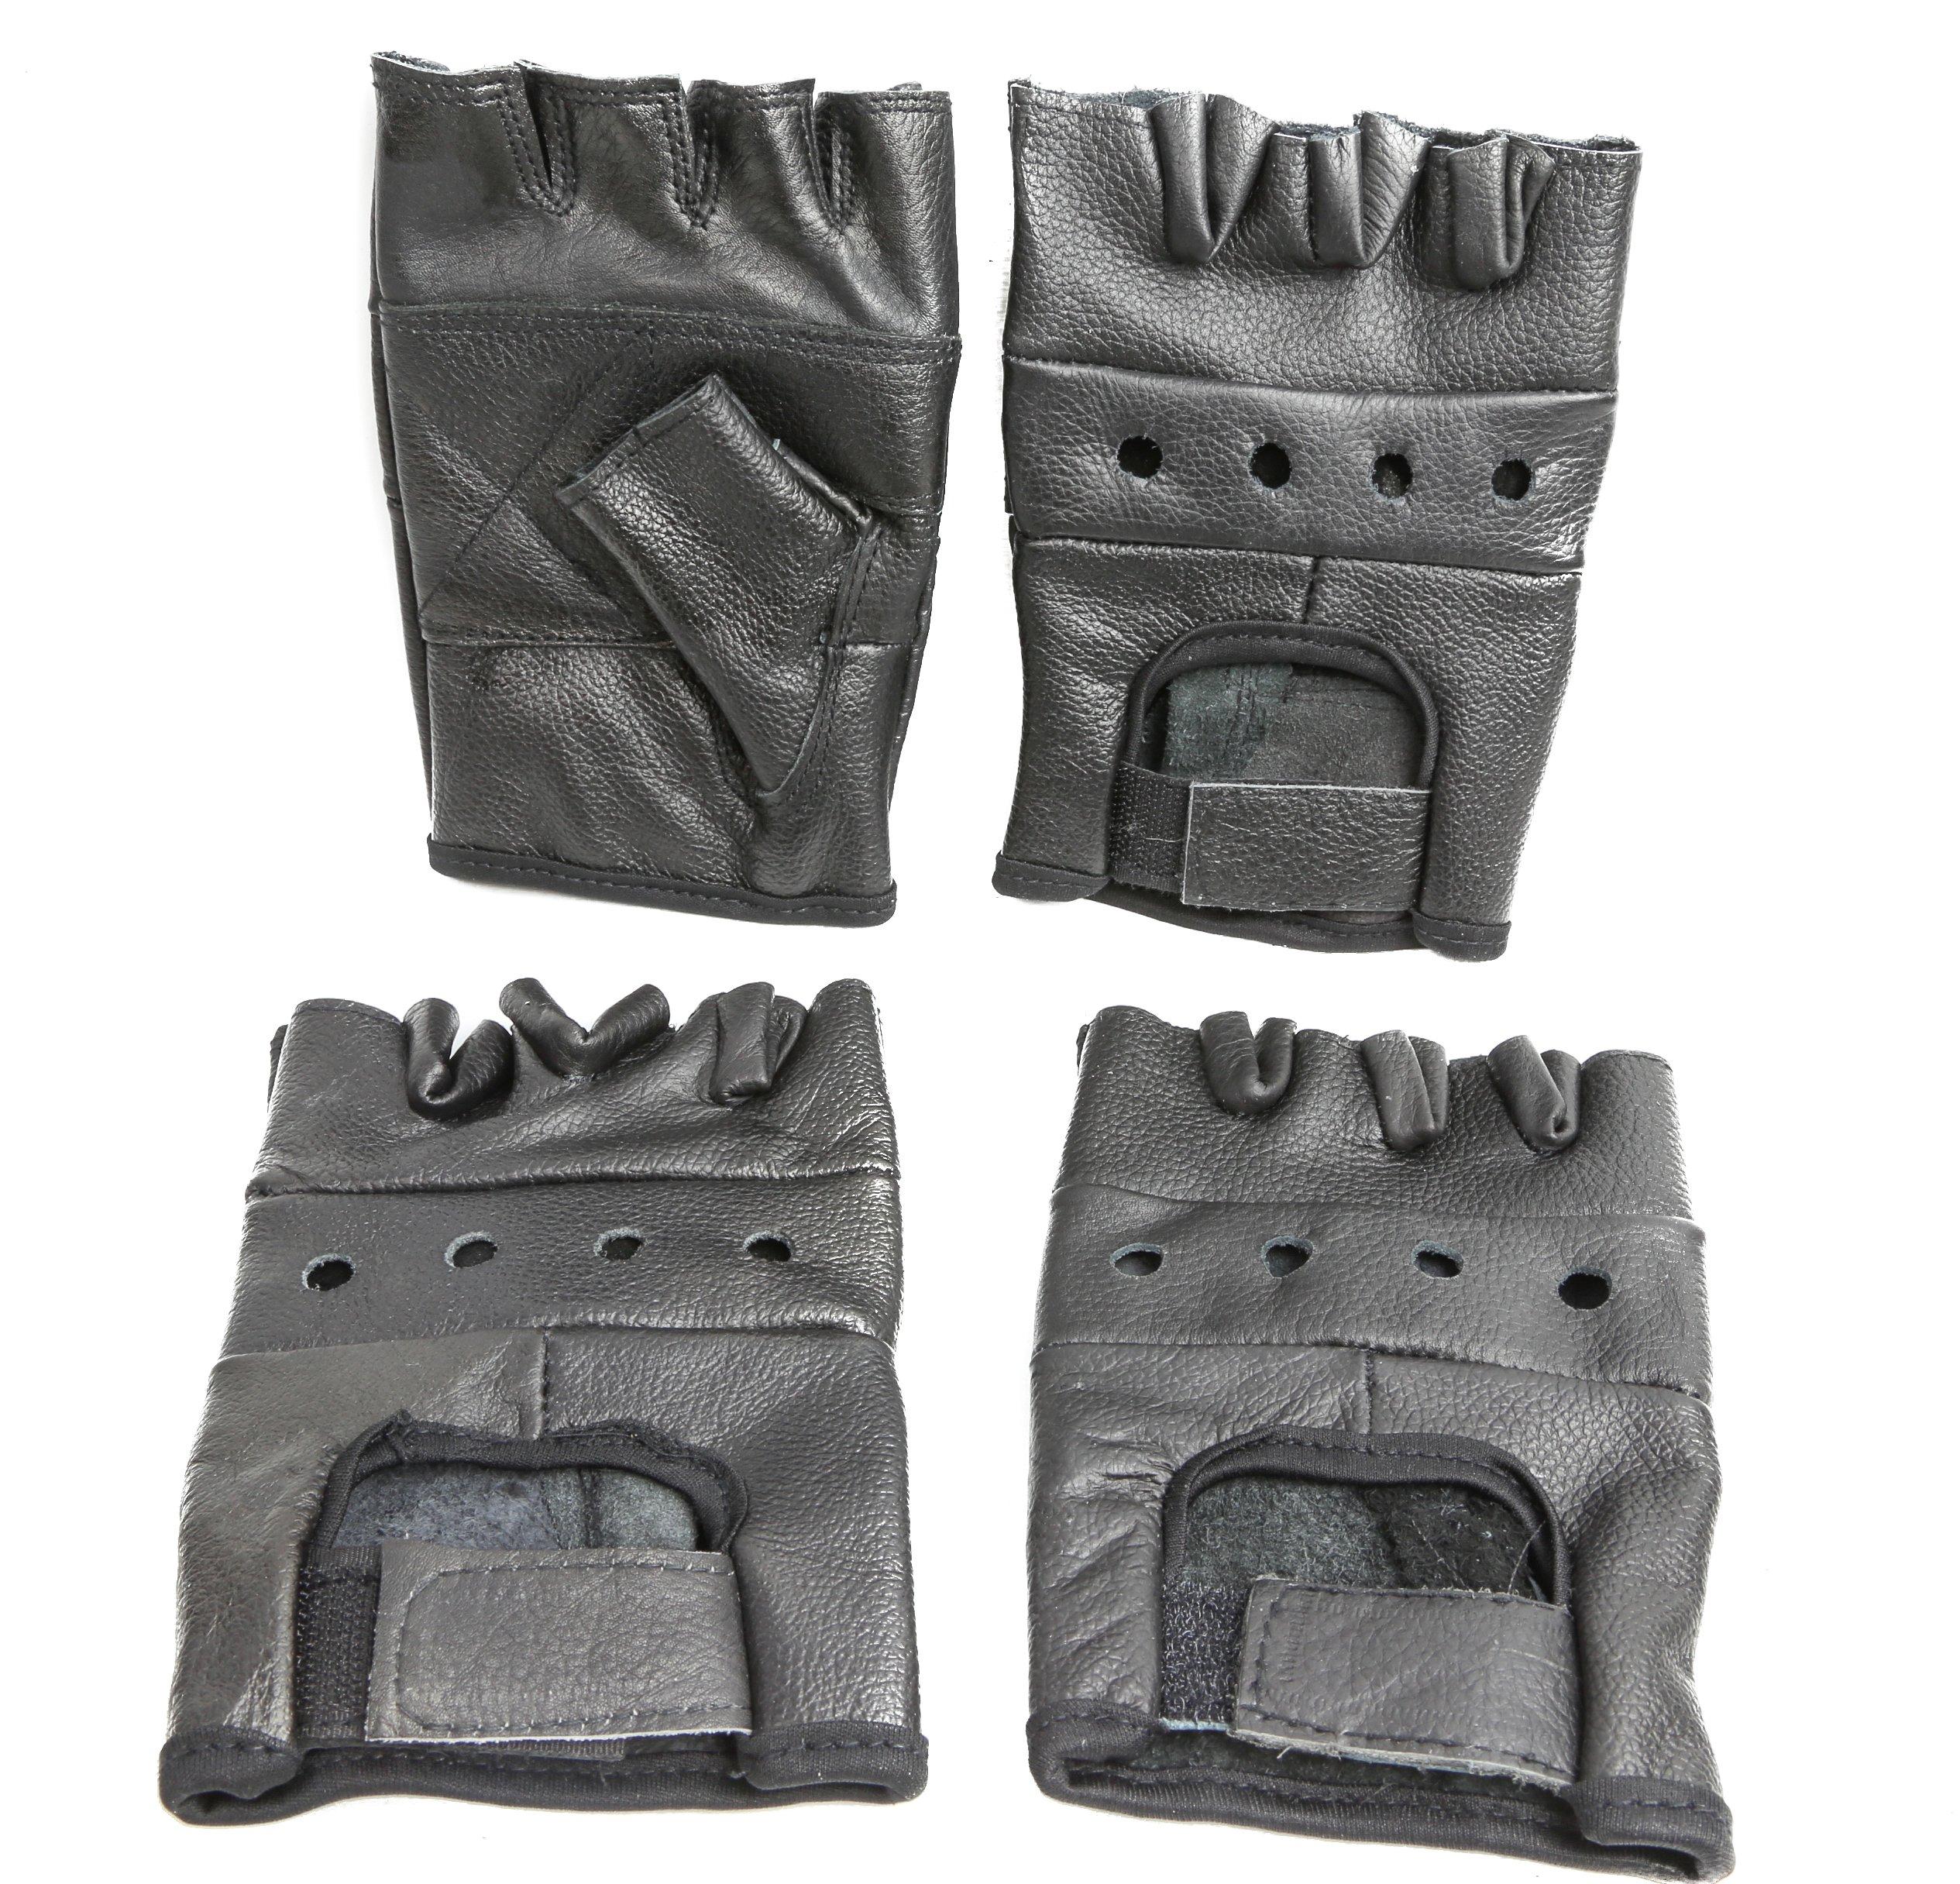 Black Leather Heavy Duty Lightweight Fingerless Gloves Pack of 2 (L)